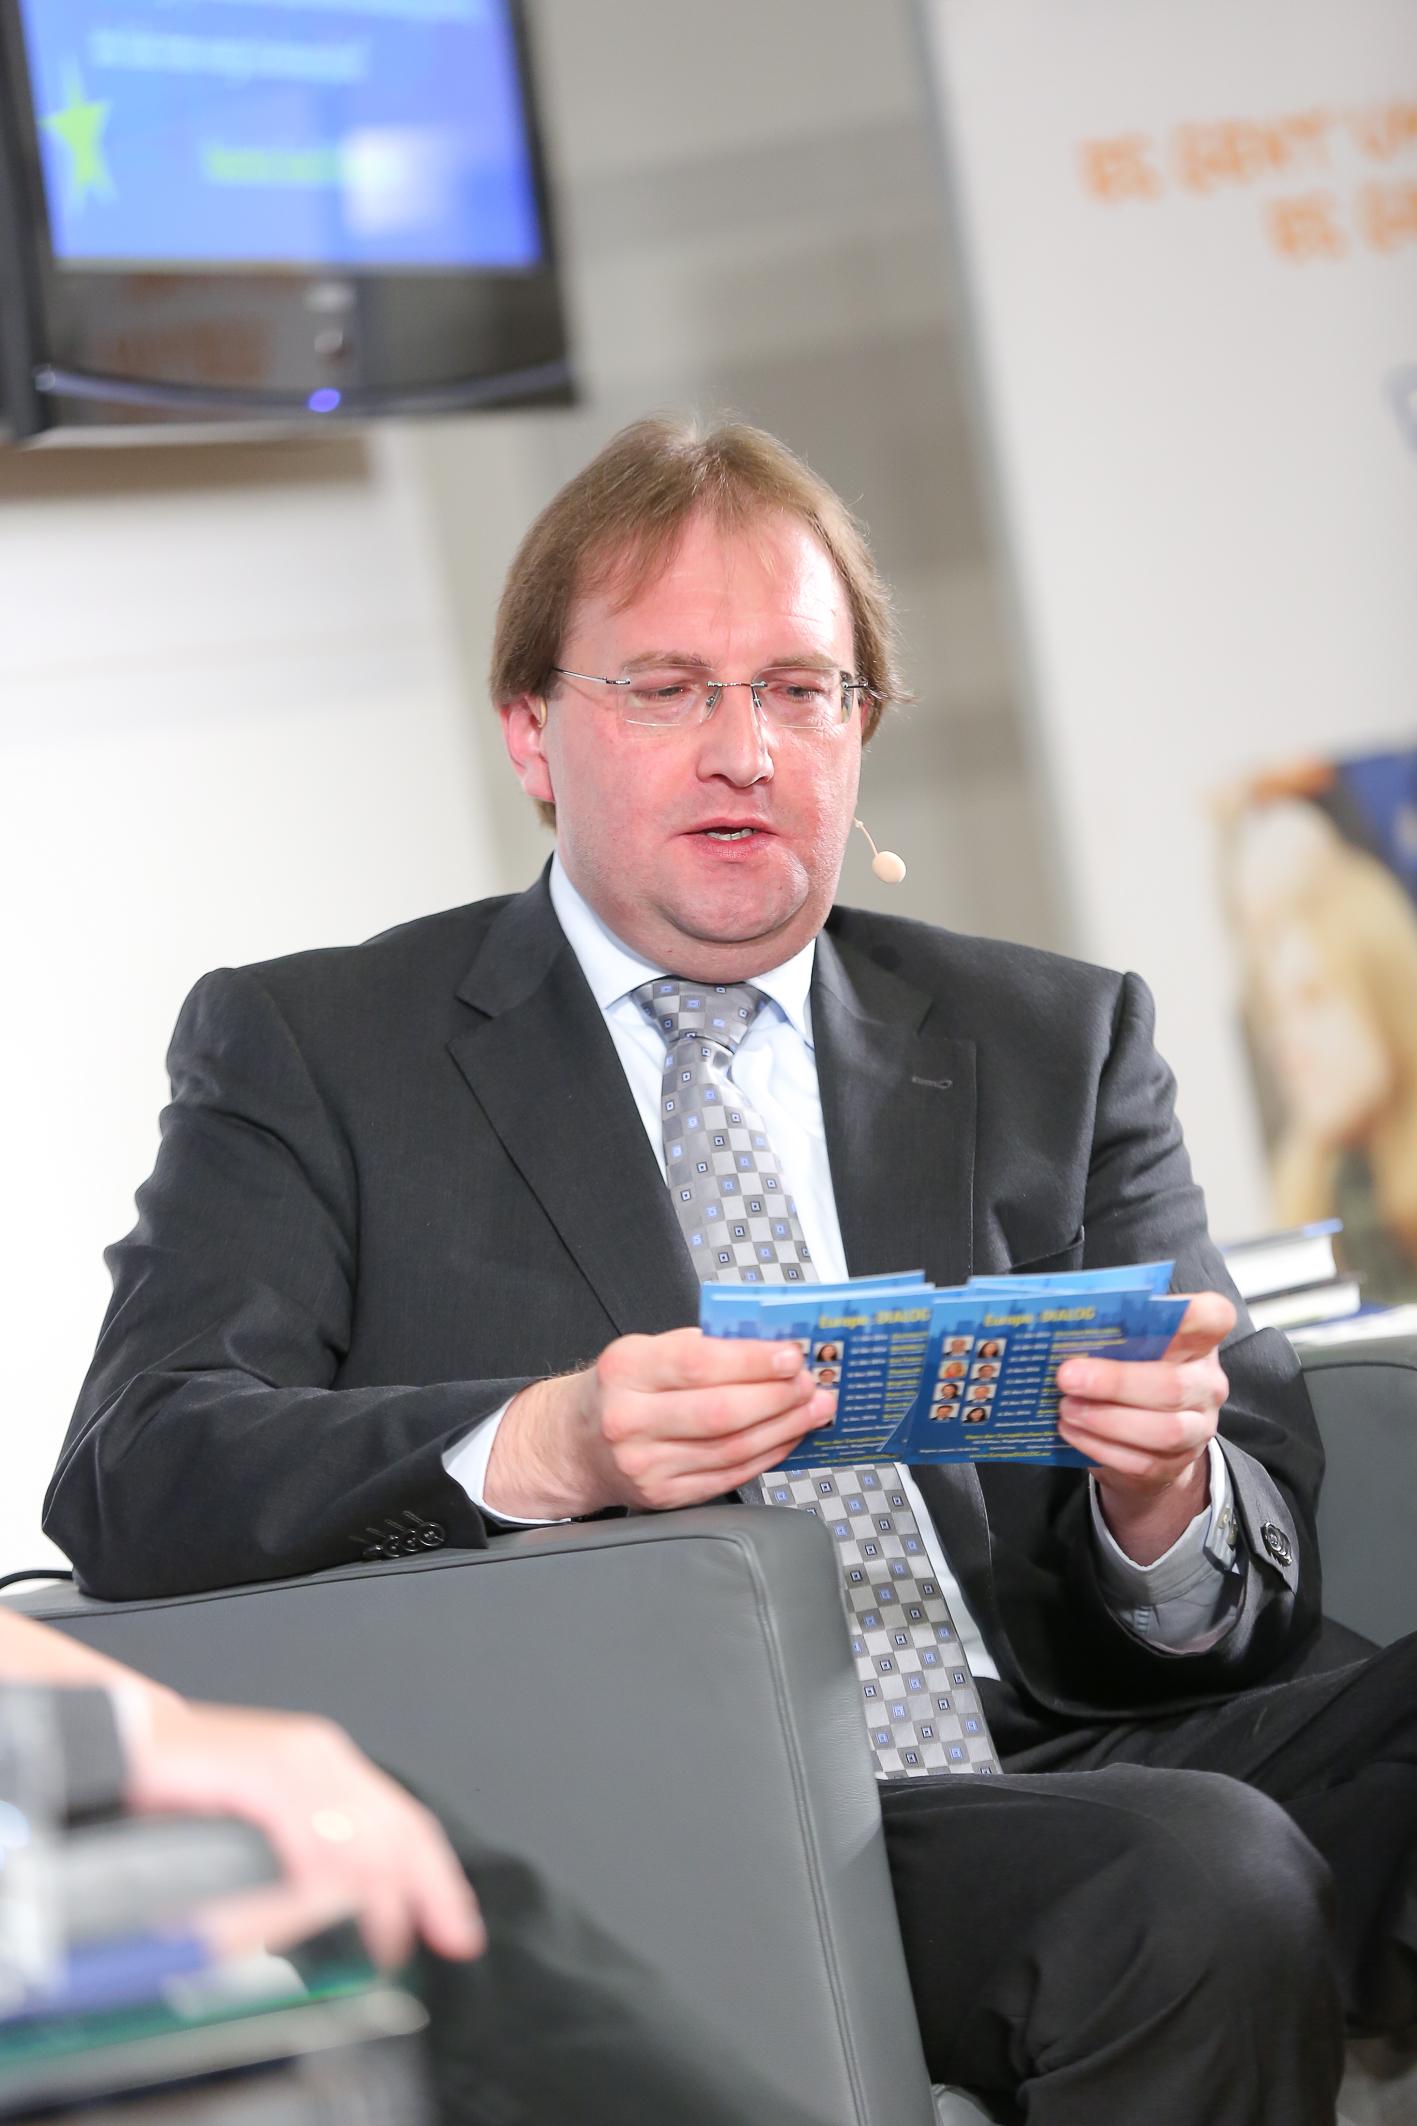 europadialog_ernst-gelegs_a12_0931__credit_moni-fellner